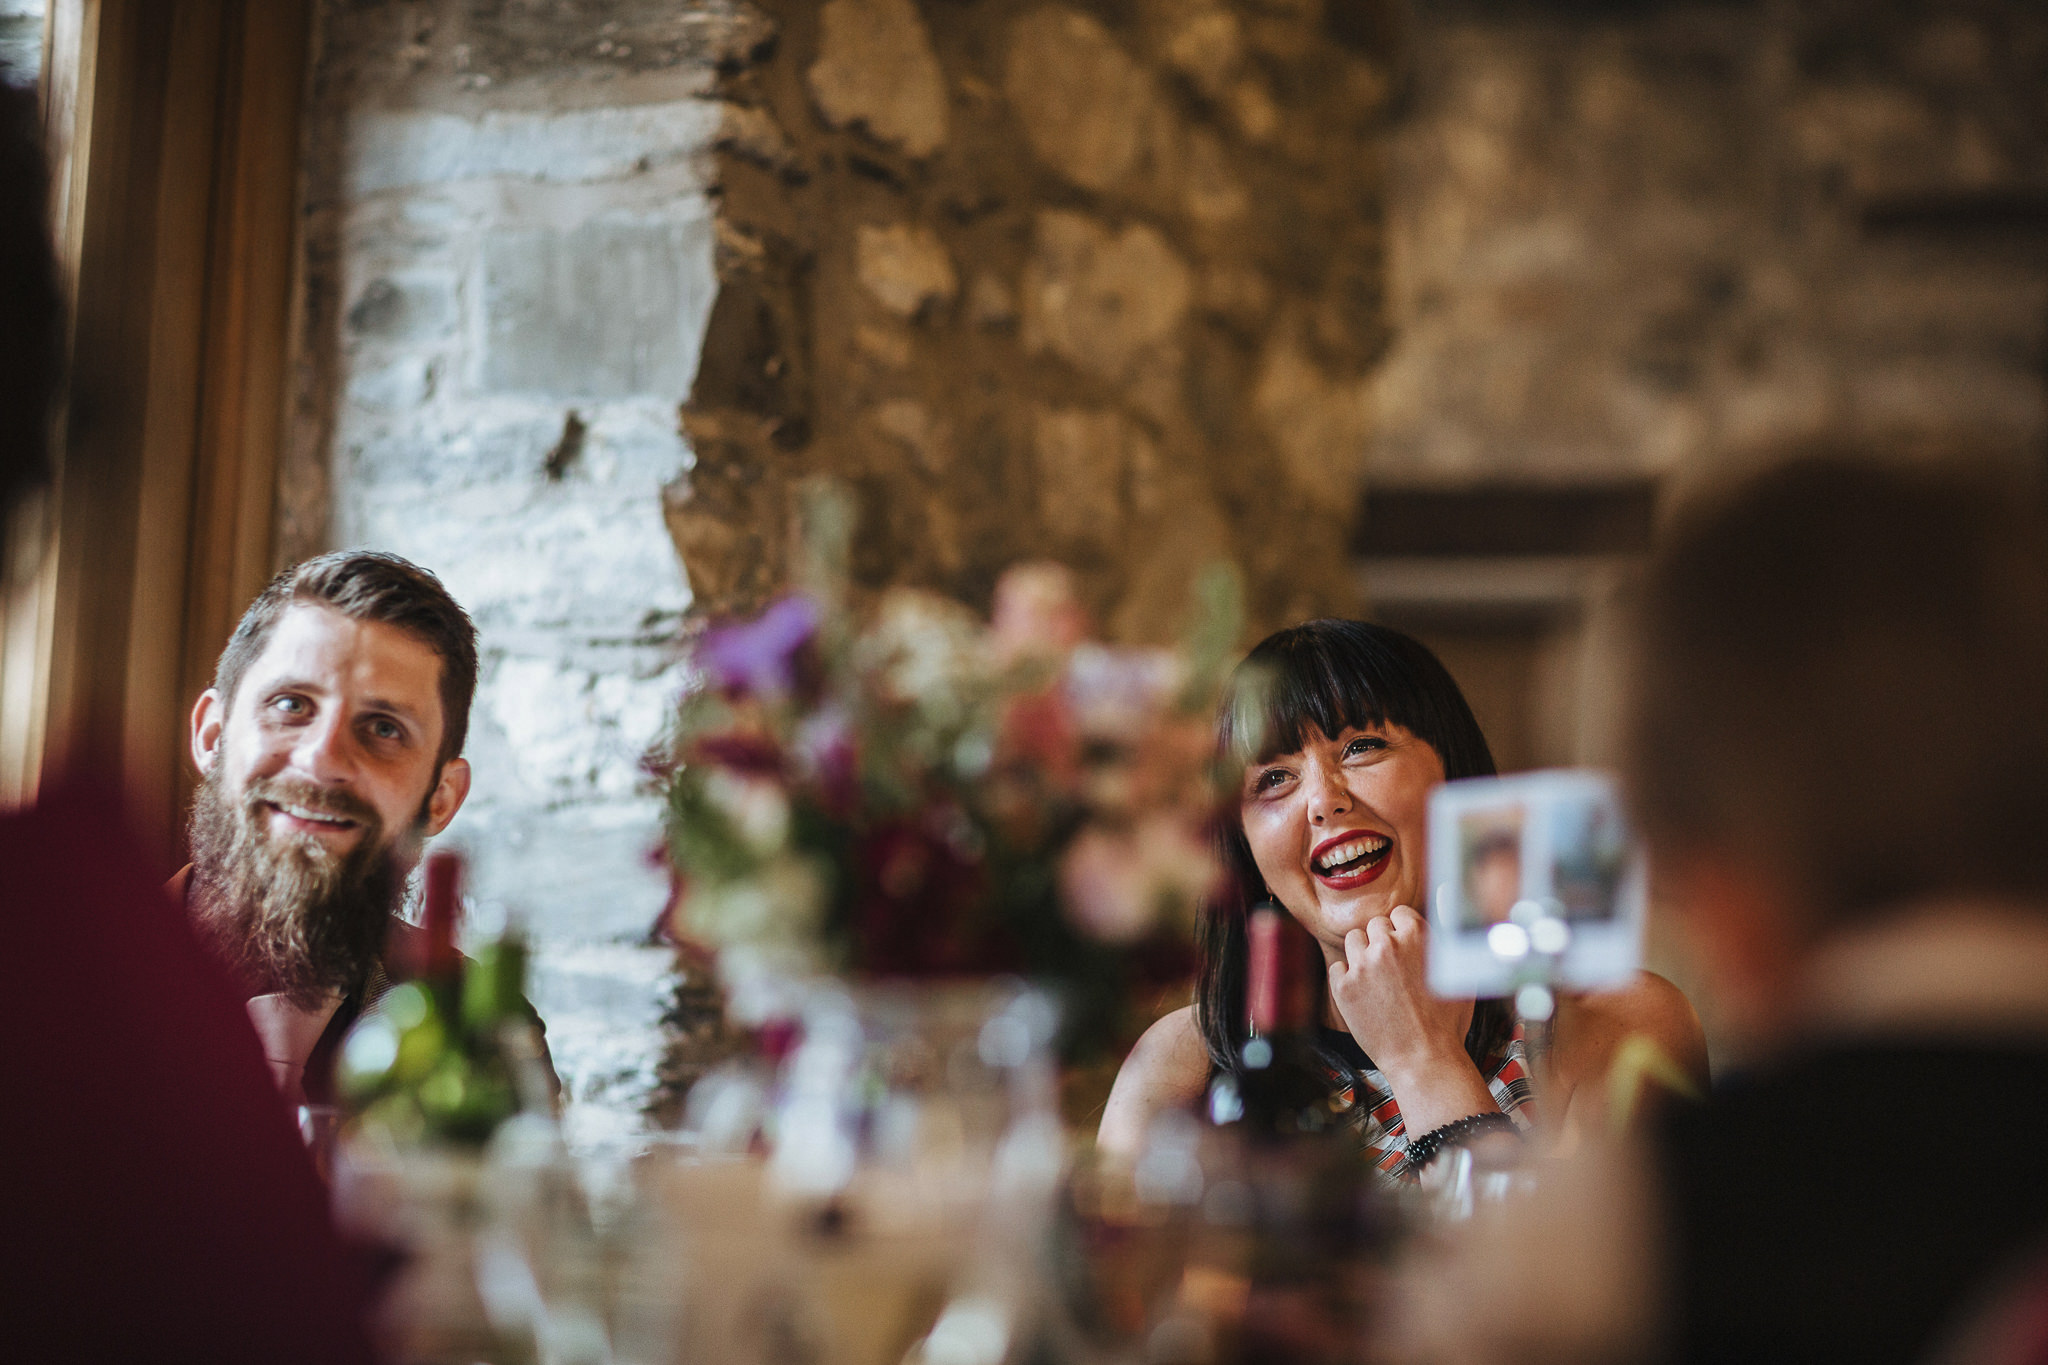 plas-isaf-corwen-north wales wedding-photography-photographer-91063